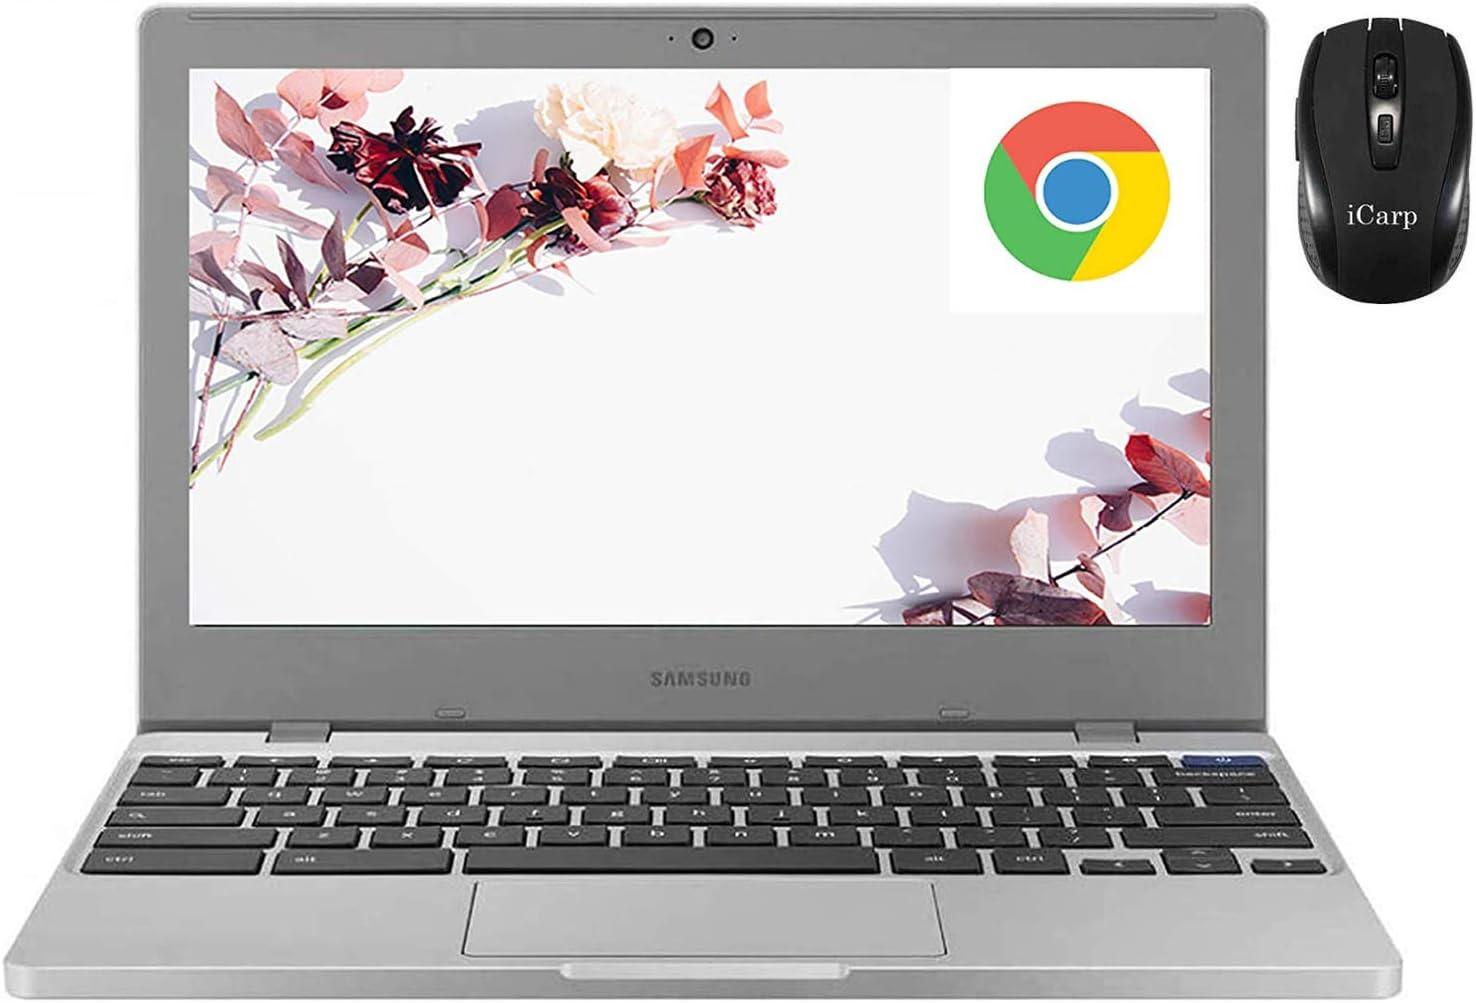 "2020FlagshipSamsung 11 Chromebook 4 LaptopComputer 11.6"" HD Display Intel Celeron Processor N4000 4GB DDR4 64GB eMMC 128GB SD Card Gigabit WiFi Type C Webcam Chrome OS + iCarpWirelessMouse"